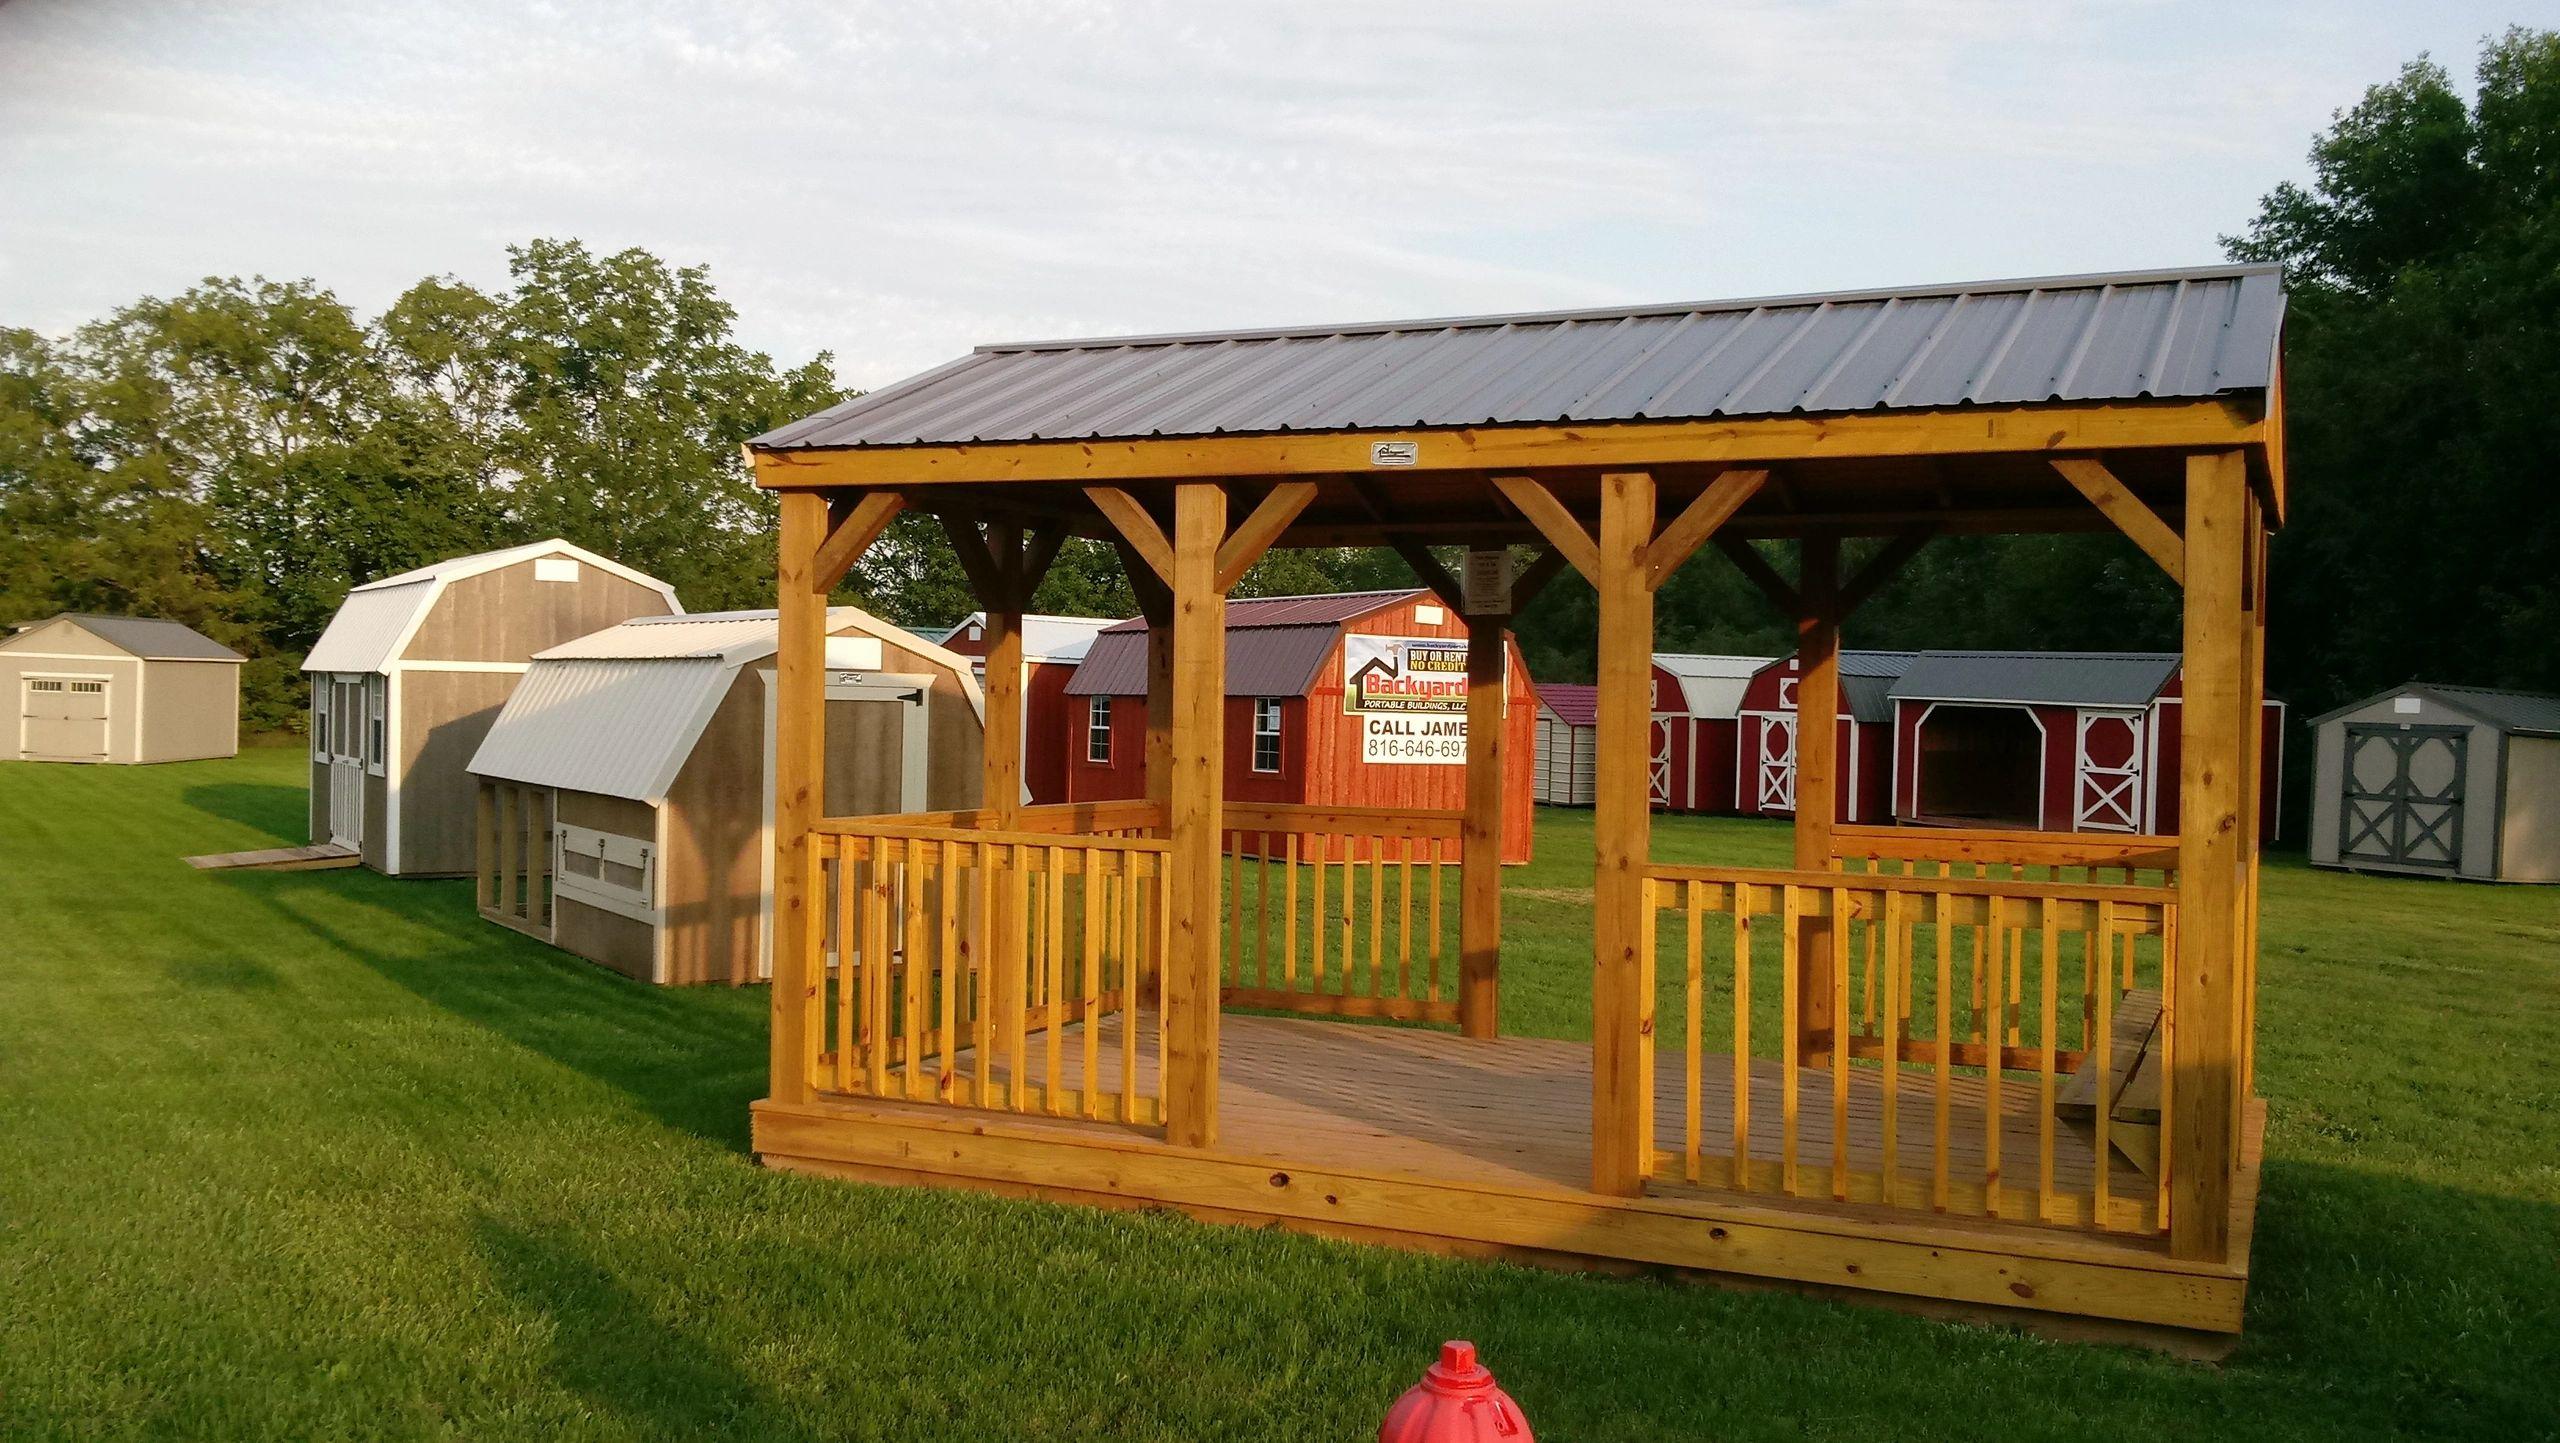 Backyard Portable Bldgs of NWMO - Portable Buildings, Shed